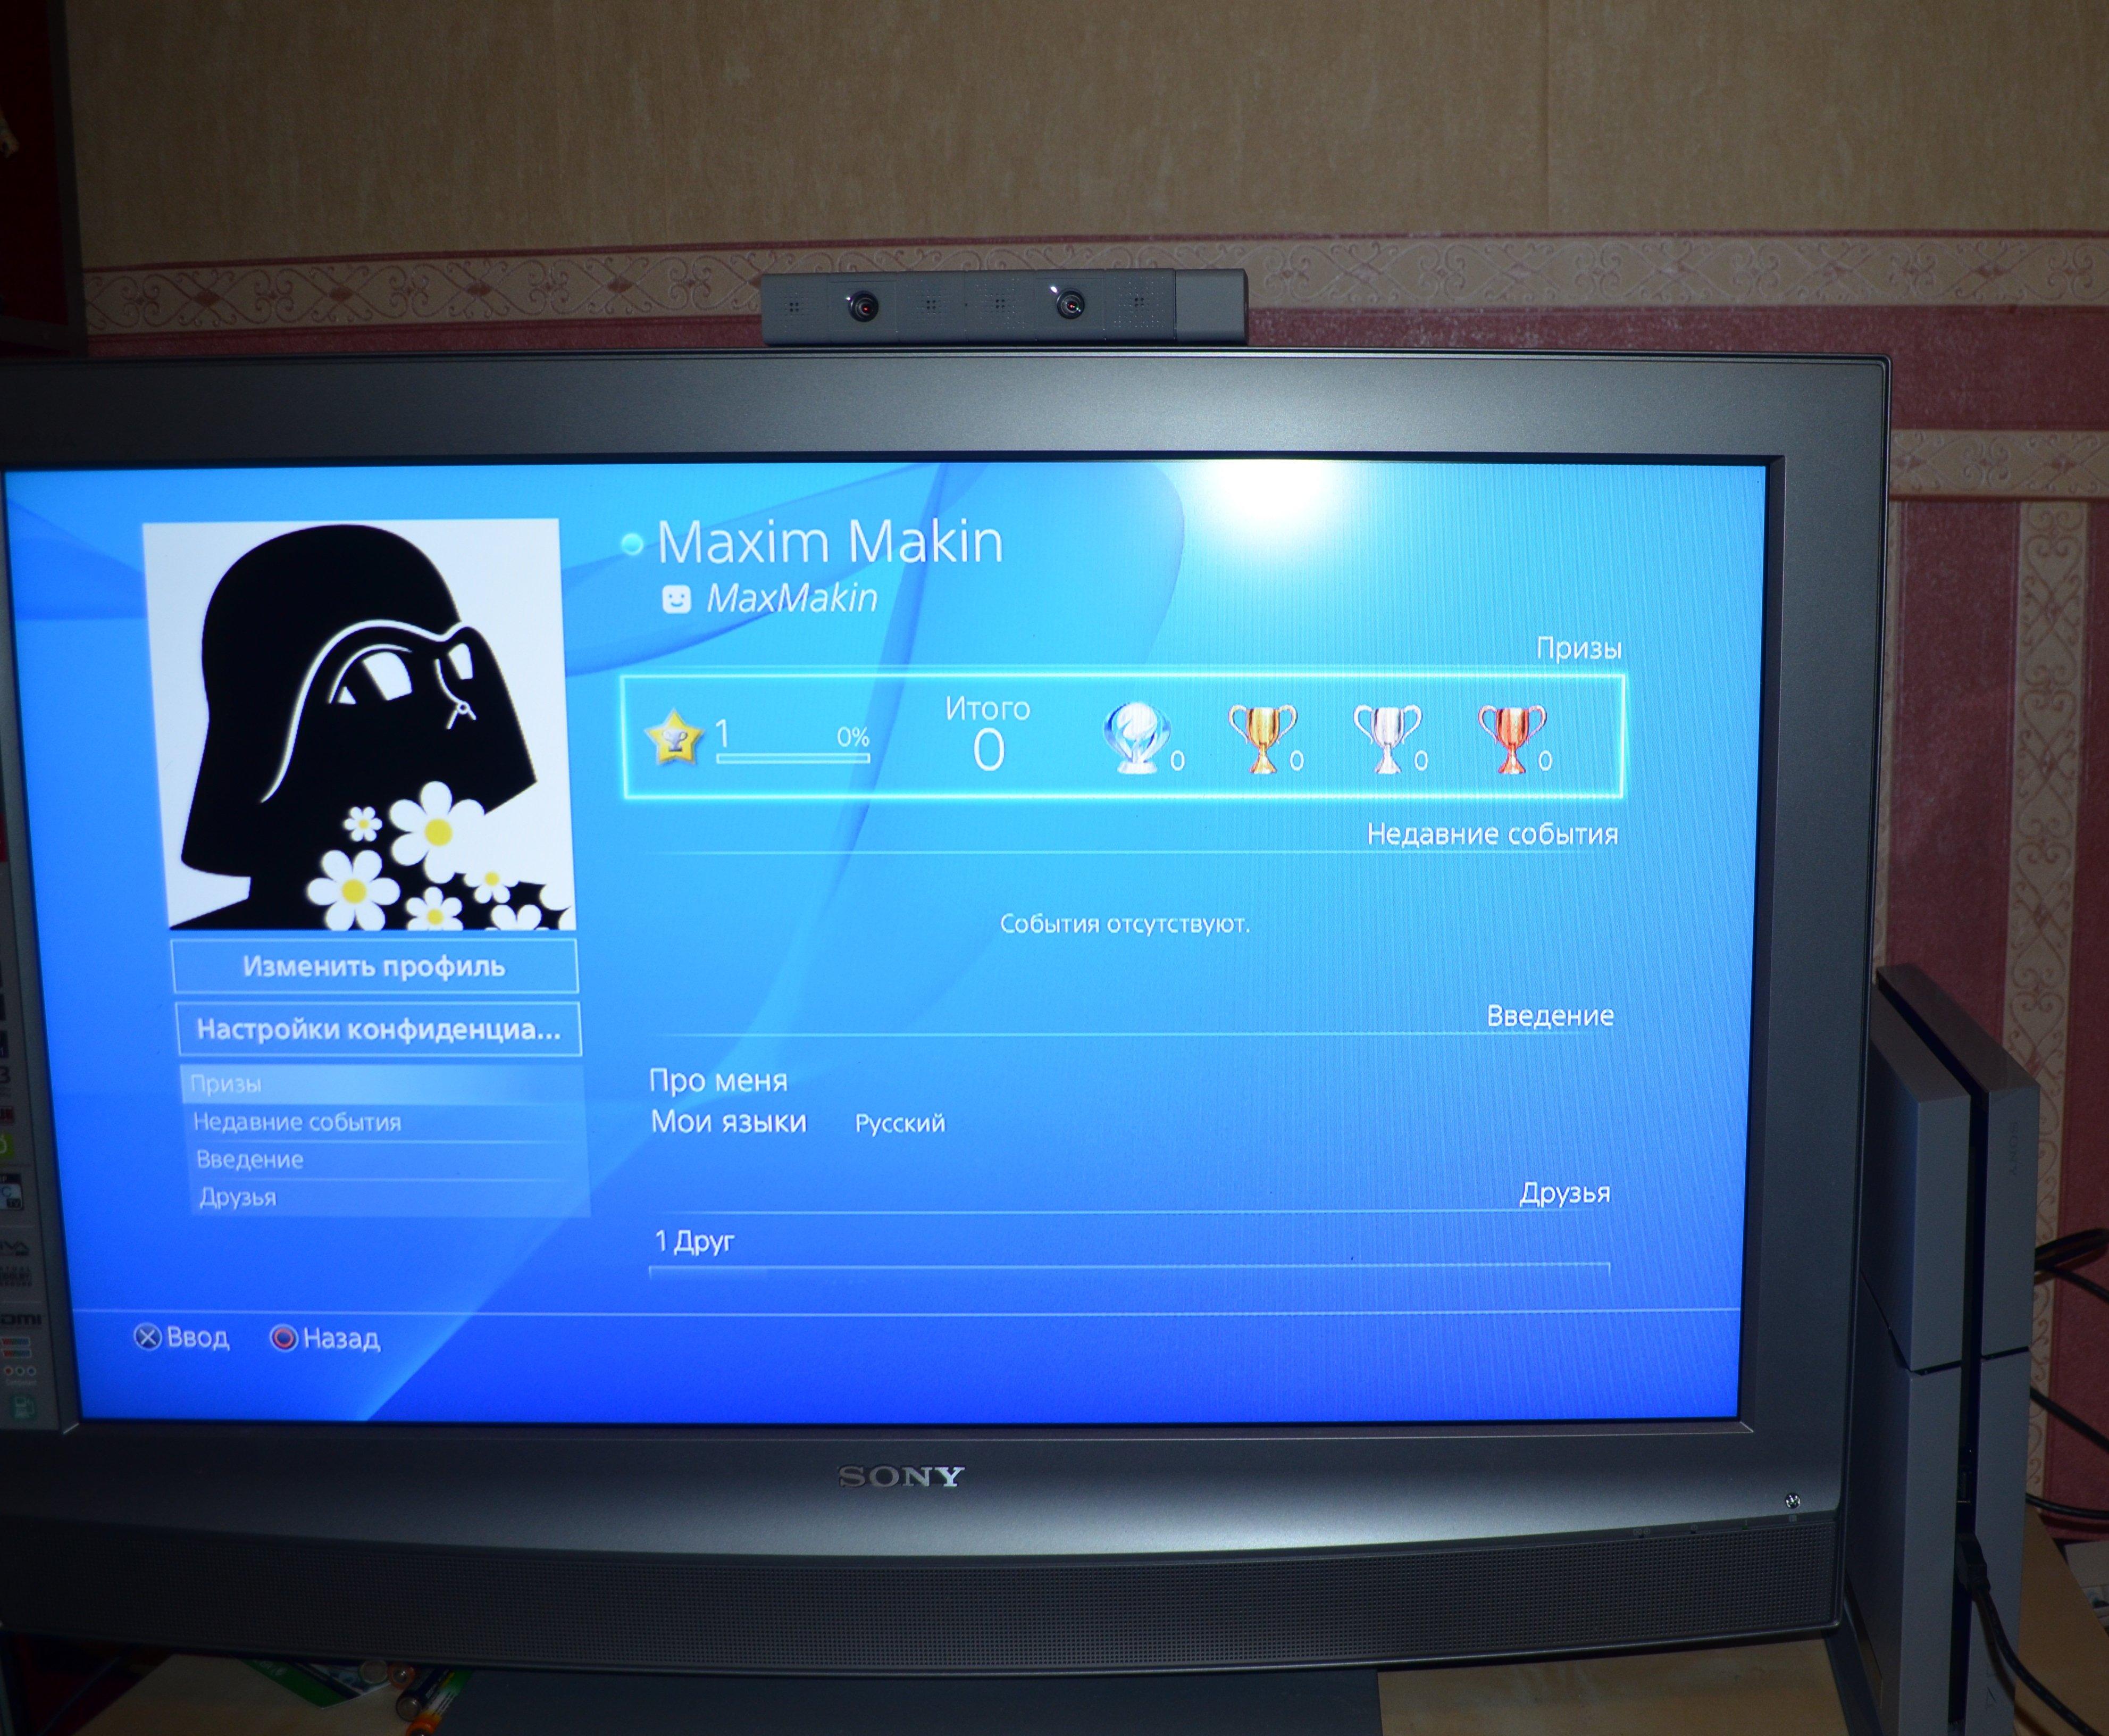 Анбоксинг Имперского издания Playstation 4 Anniversary Edition - Изображение 27